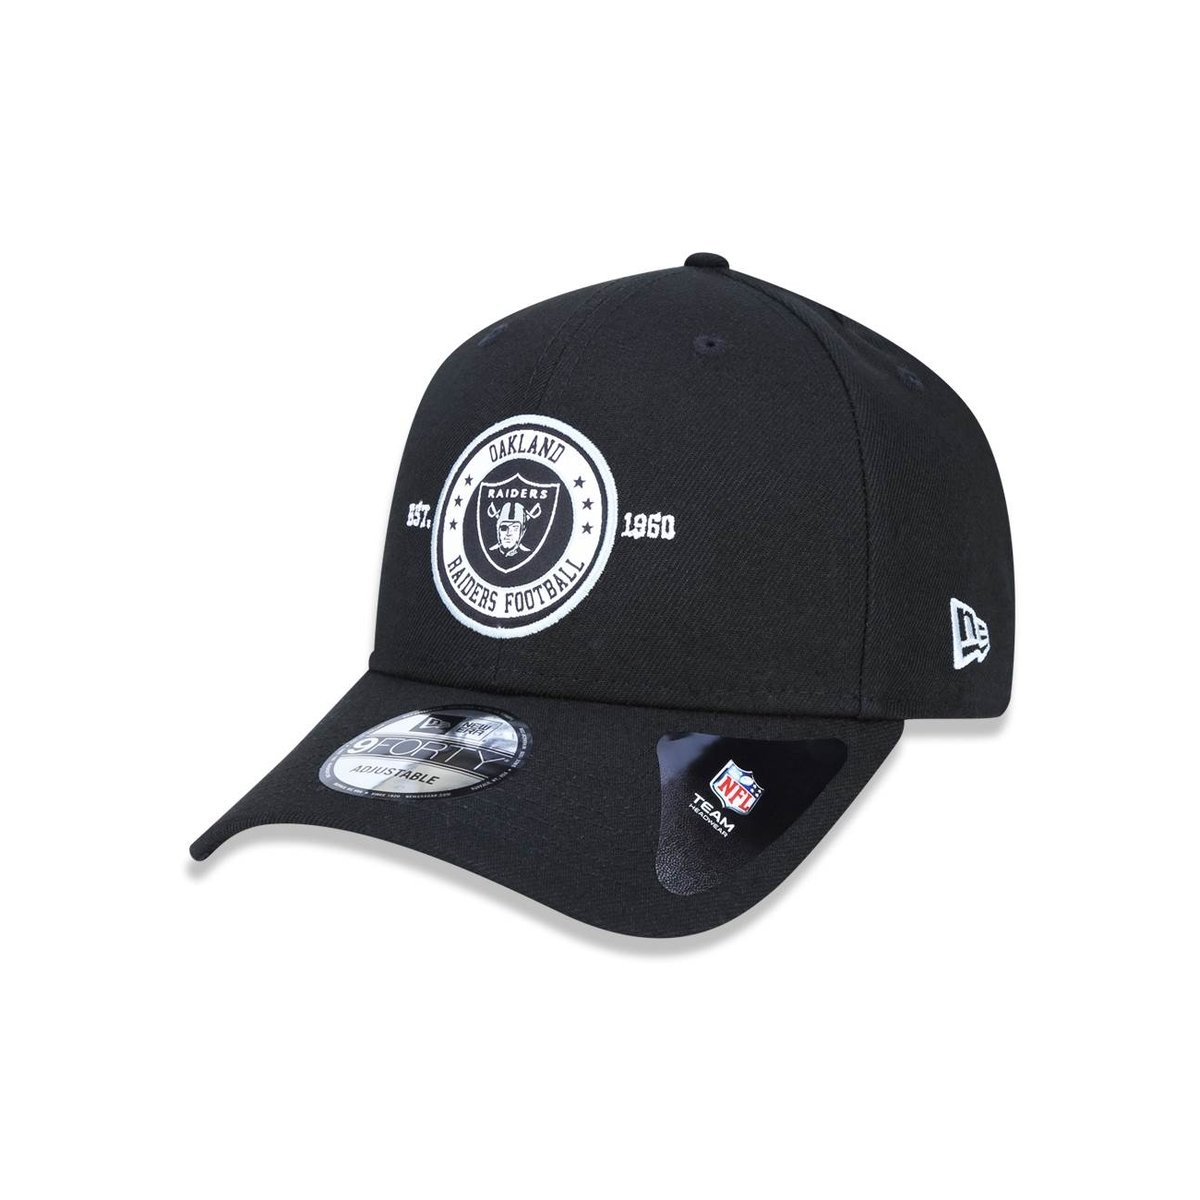 Boné 940 Oakland Raiders NFL Aba Curva Snapback New Era - Compre ... de20aef1e89f3